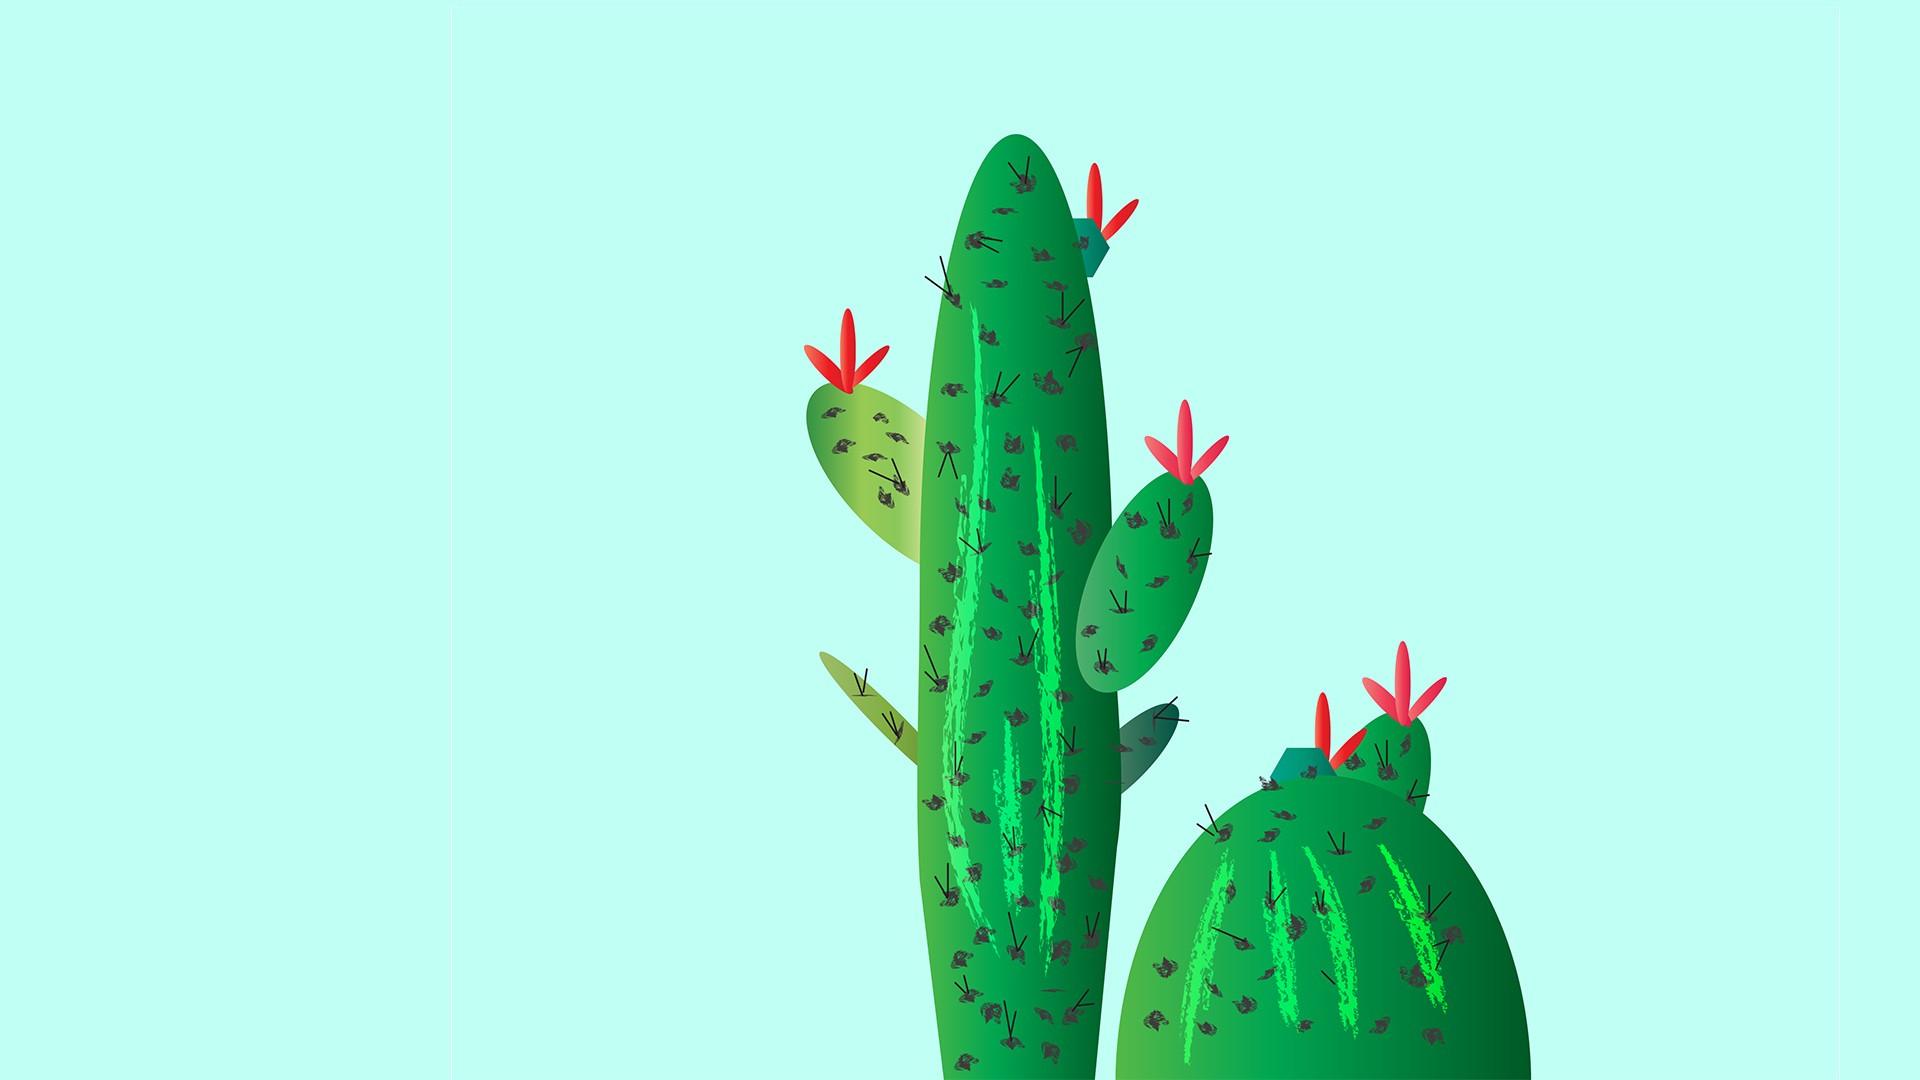 Cactus Wallpaper 183 ① Download Free Beautiful Wallpapers For